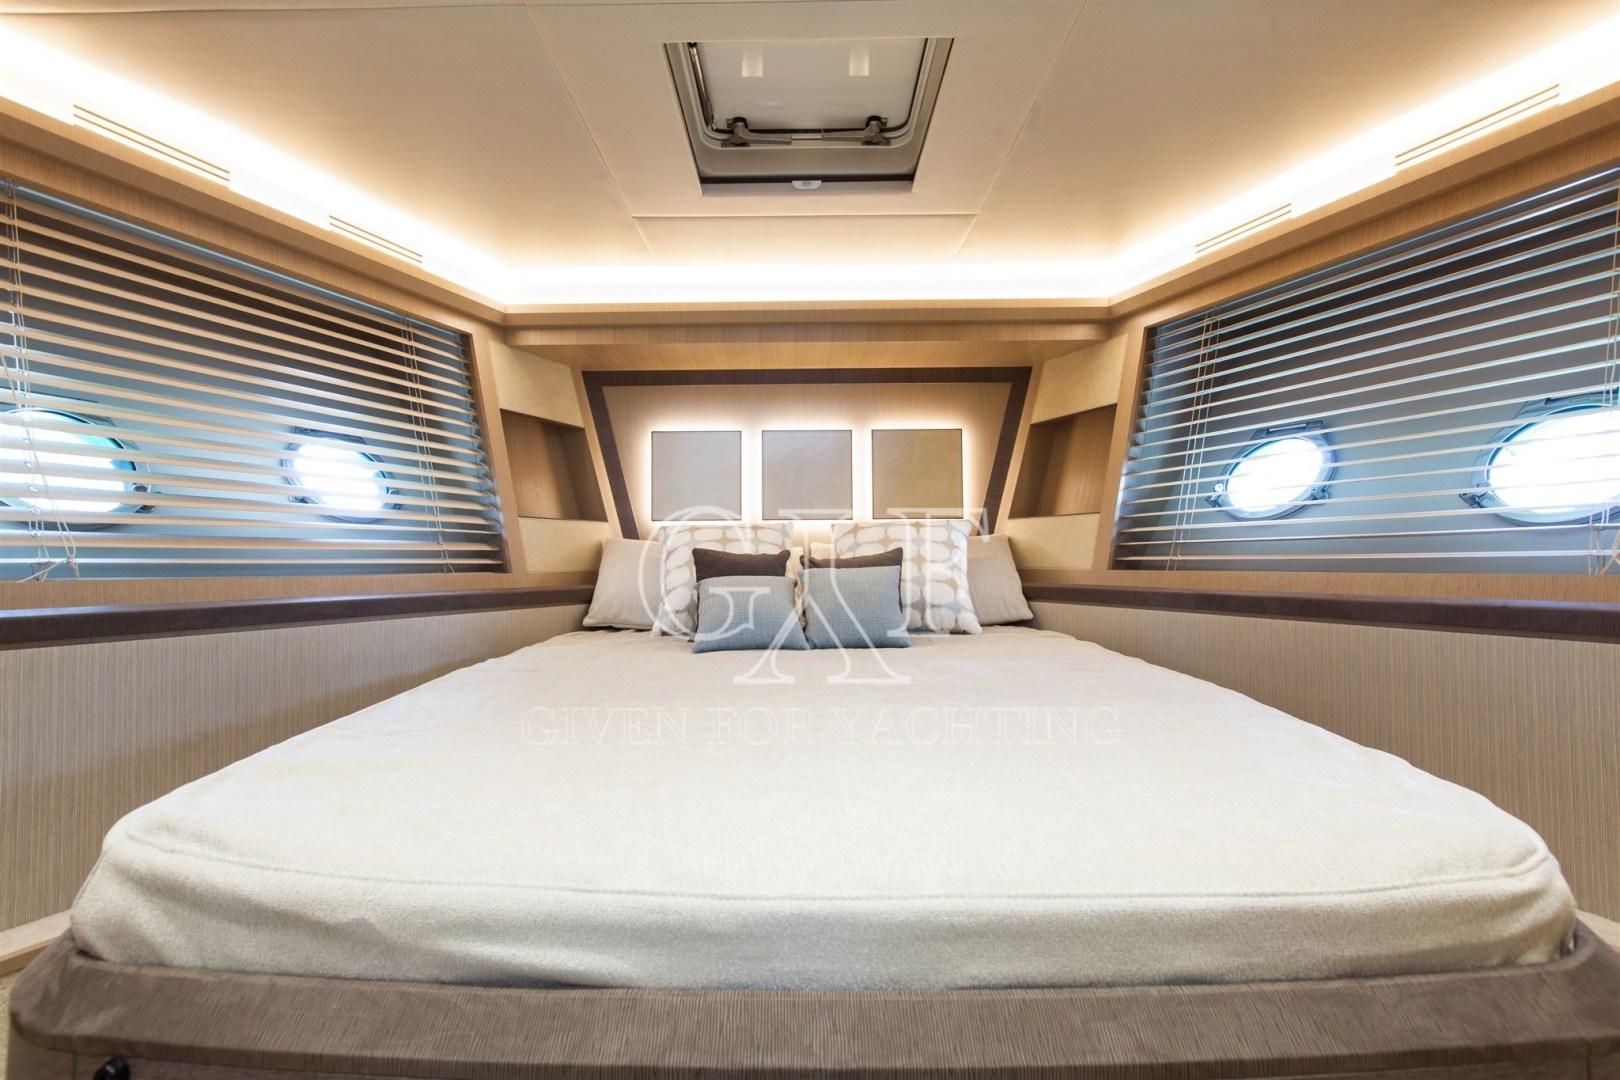 Monte Carlo-MCY 65 2016-EXCALIBUR Varazze-Italy-MCY 65, Vip Cabin Logo-1309590   Thumbnail